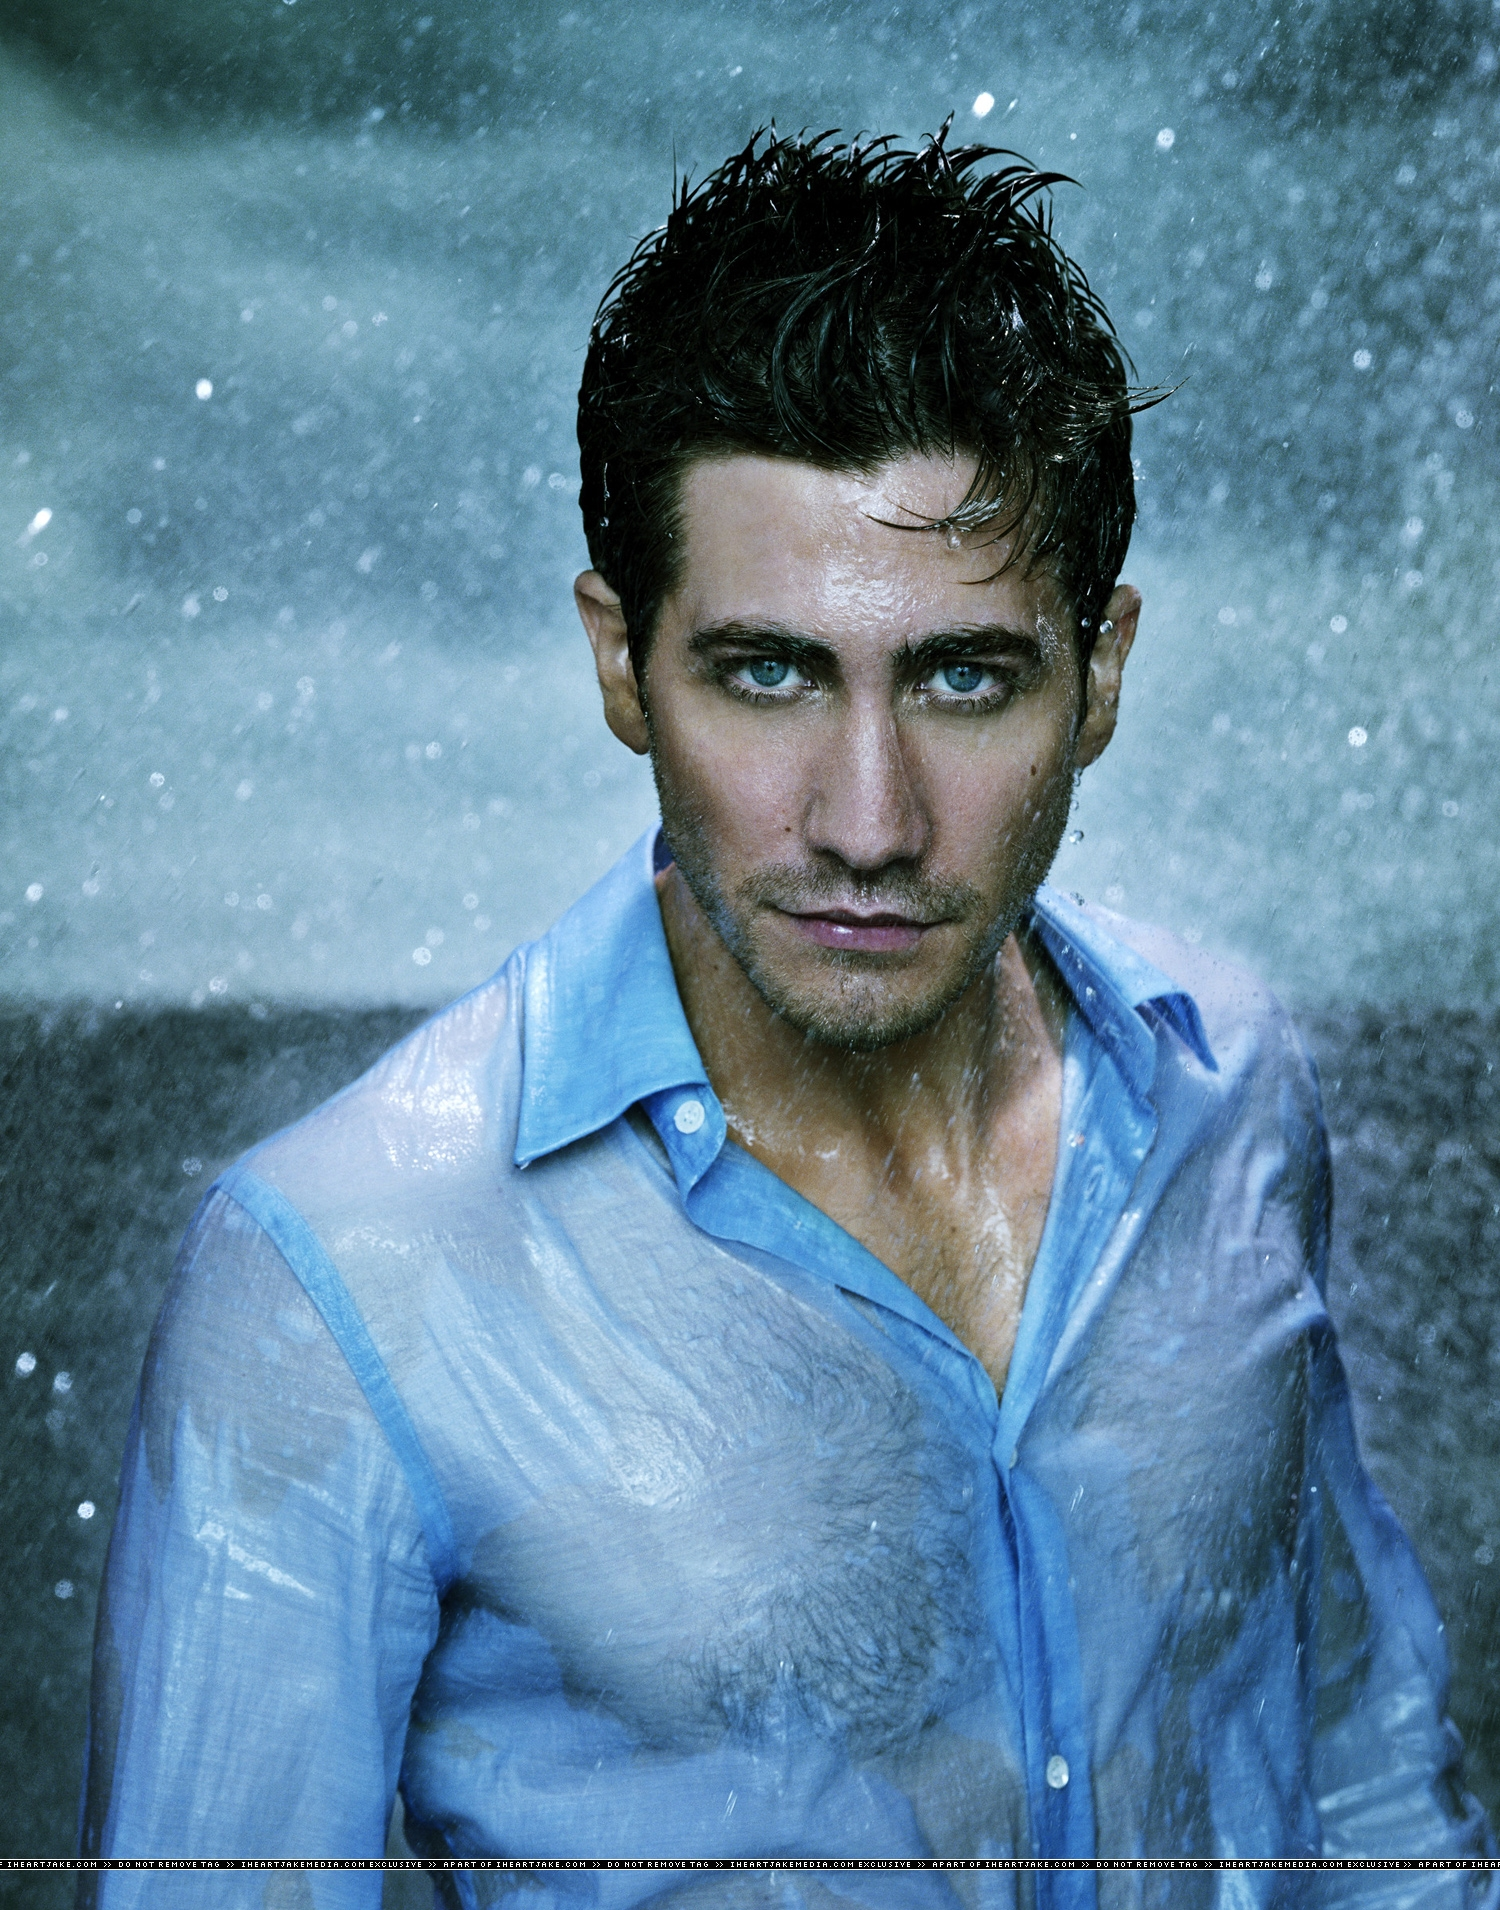 Jake - Jake Gyllenhaal... Jake Gyllenhaal